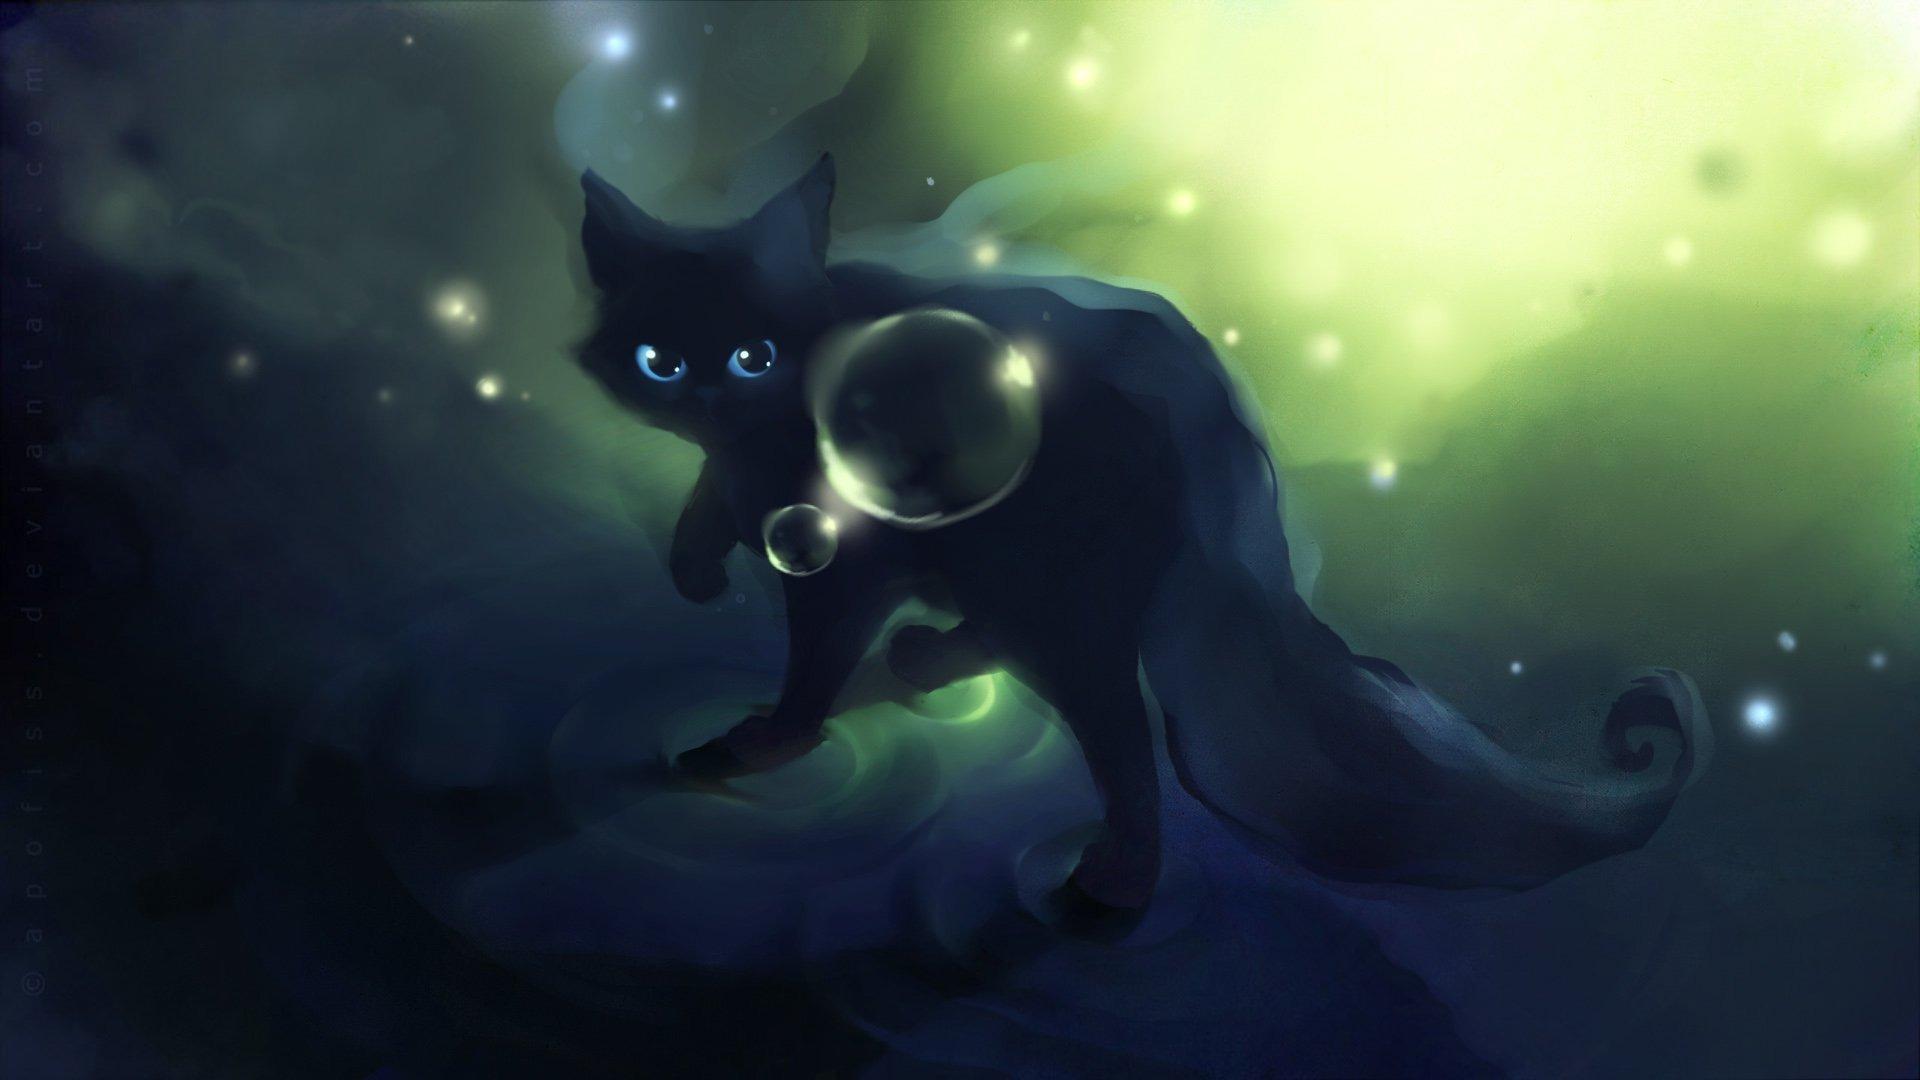 Apofiss-small-black-cat-watercolor-illustrations-1920x1080-wallpaper-wp3602641